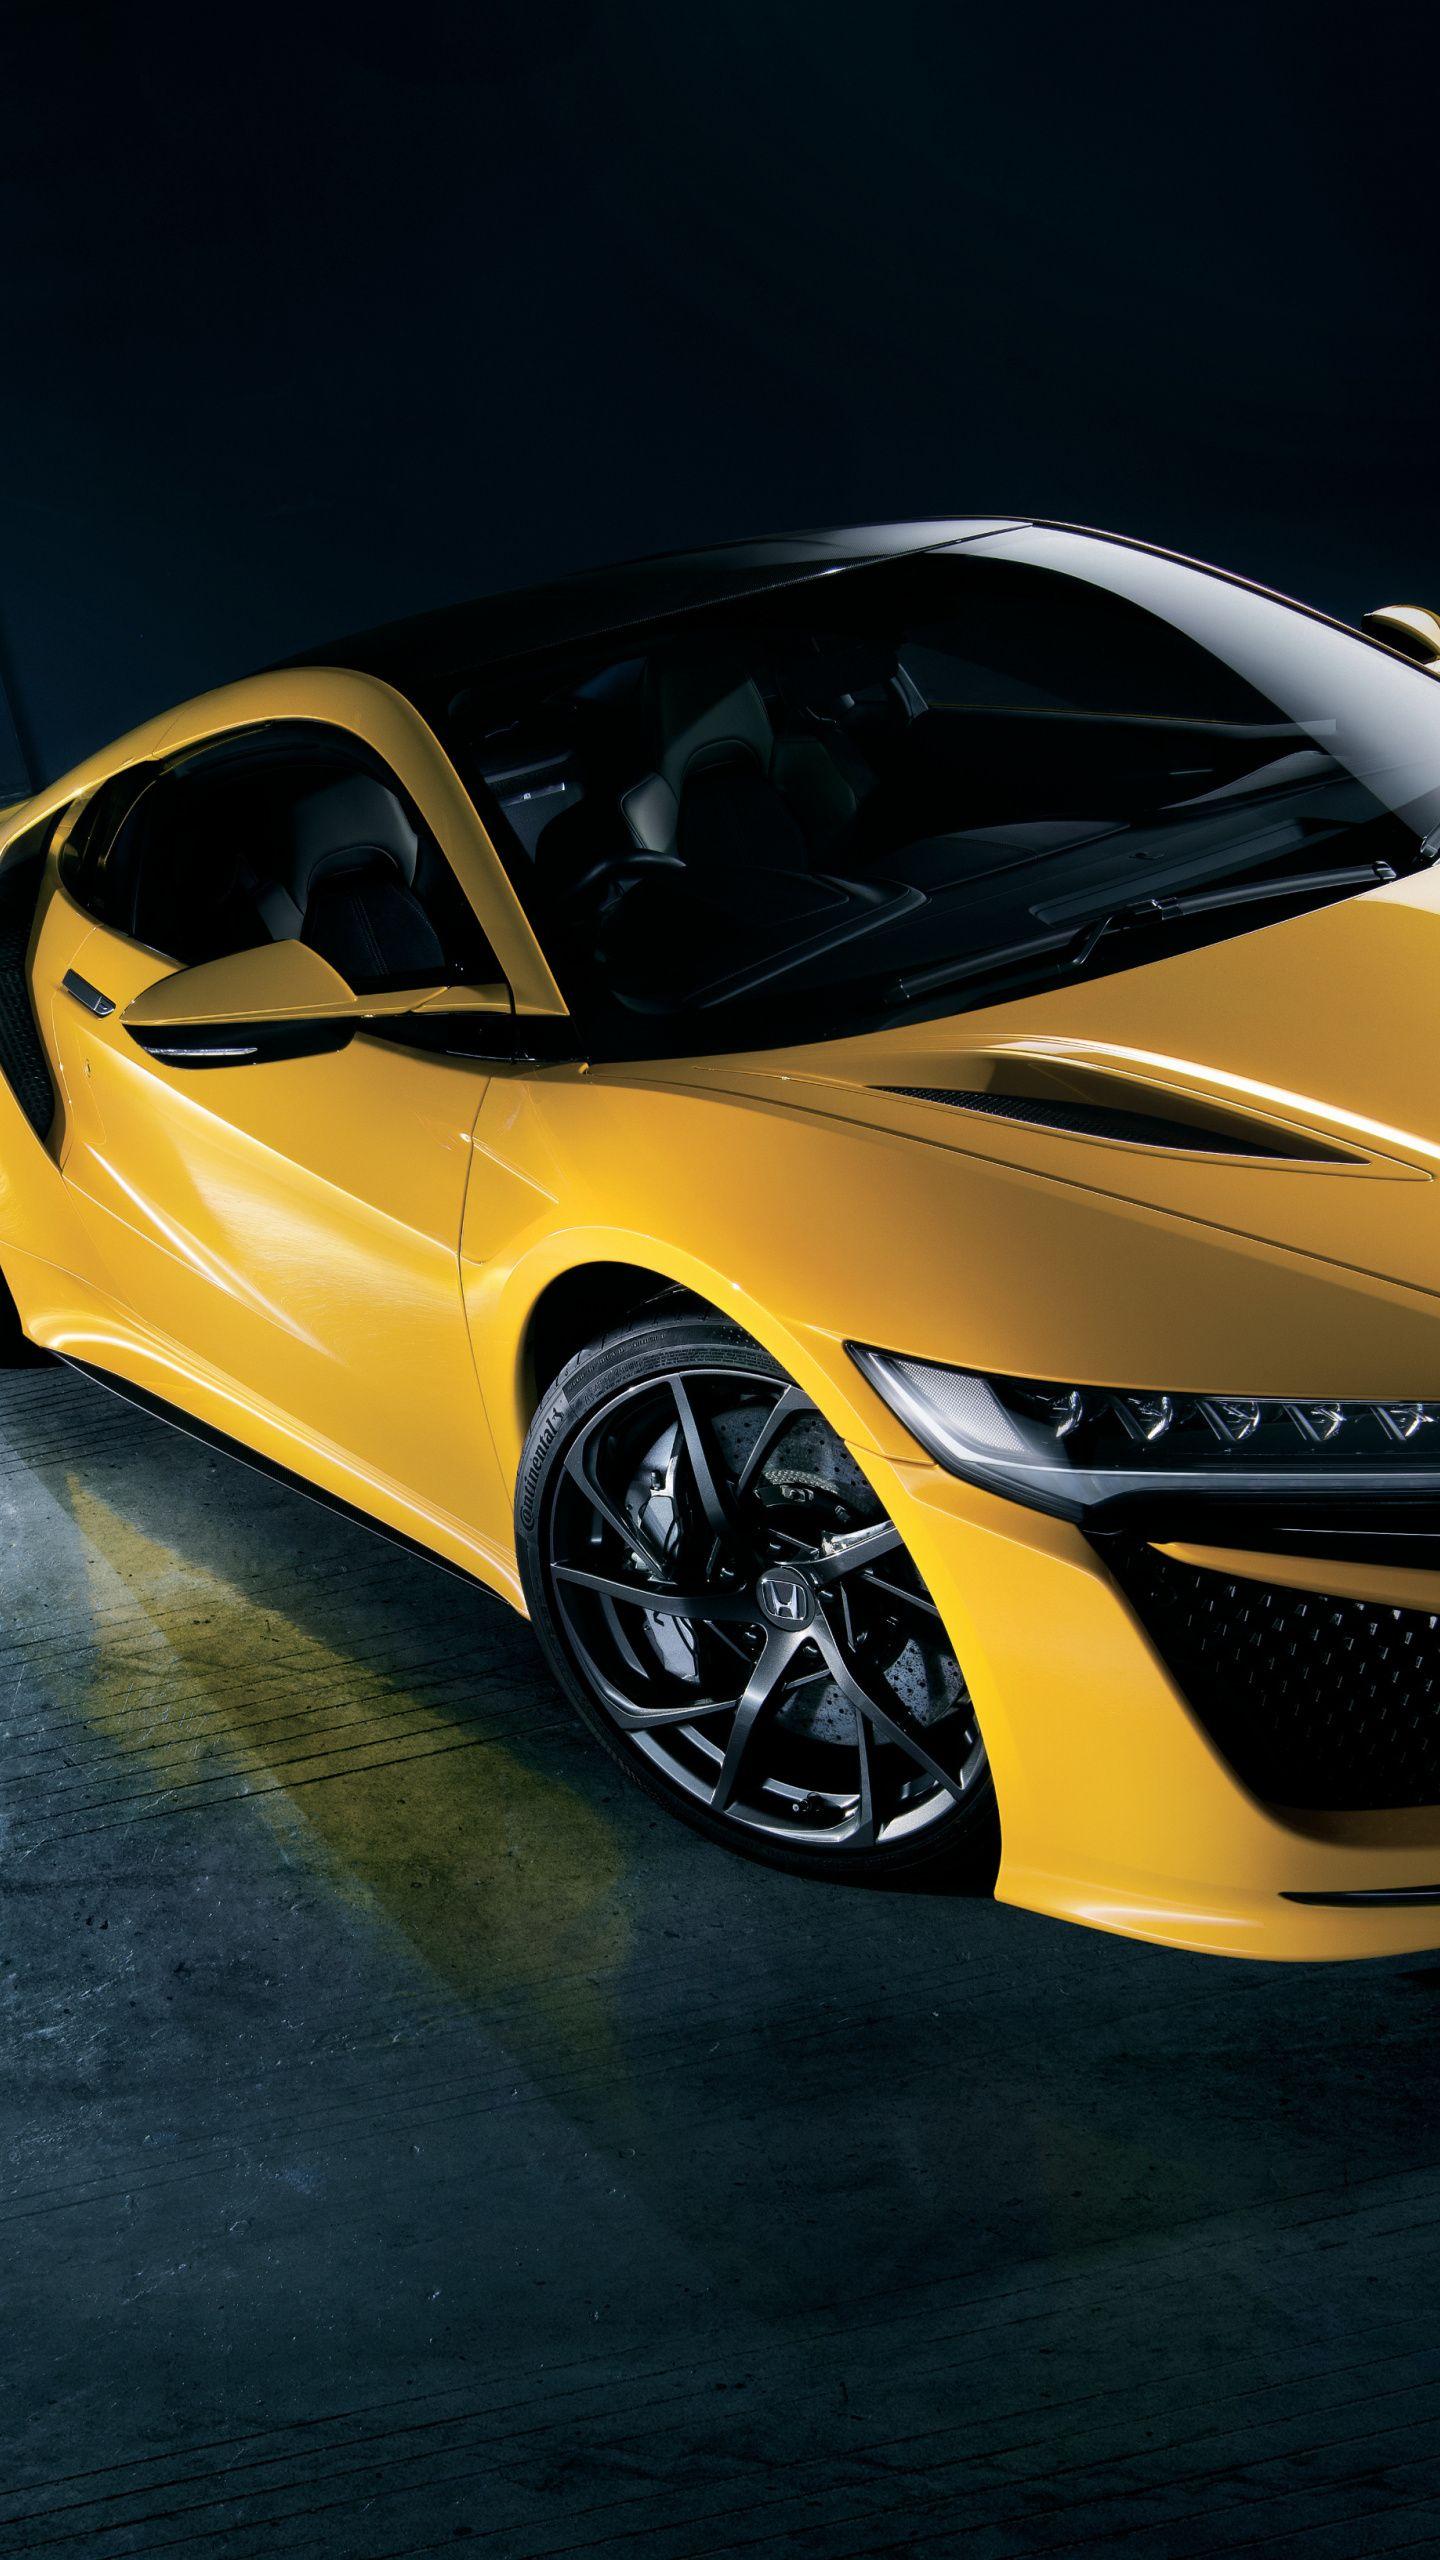 1440x2560 Honda Nsx Yellow Car 2020 Wallpaper In 2020 Yellow Car Nsx Lux Cars